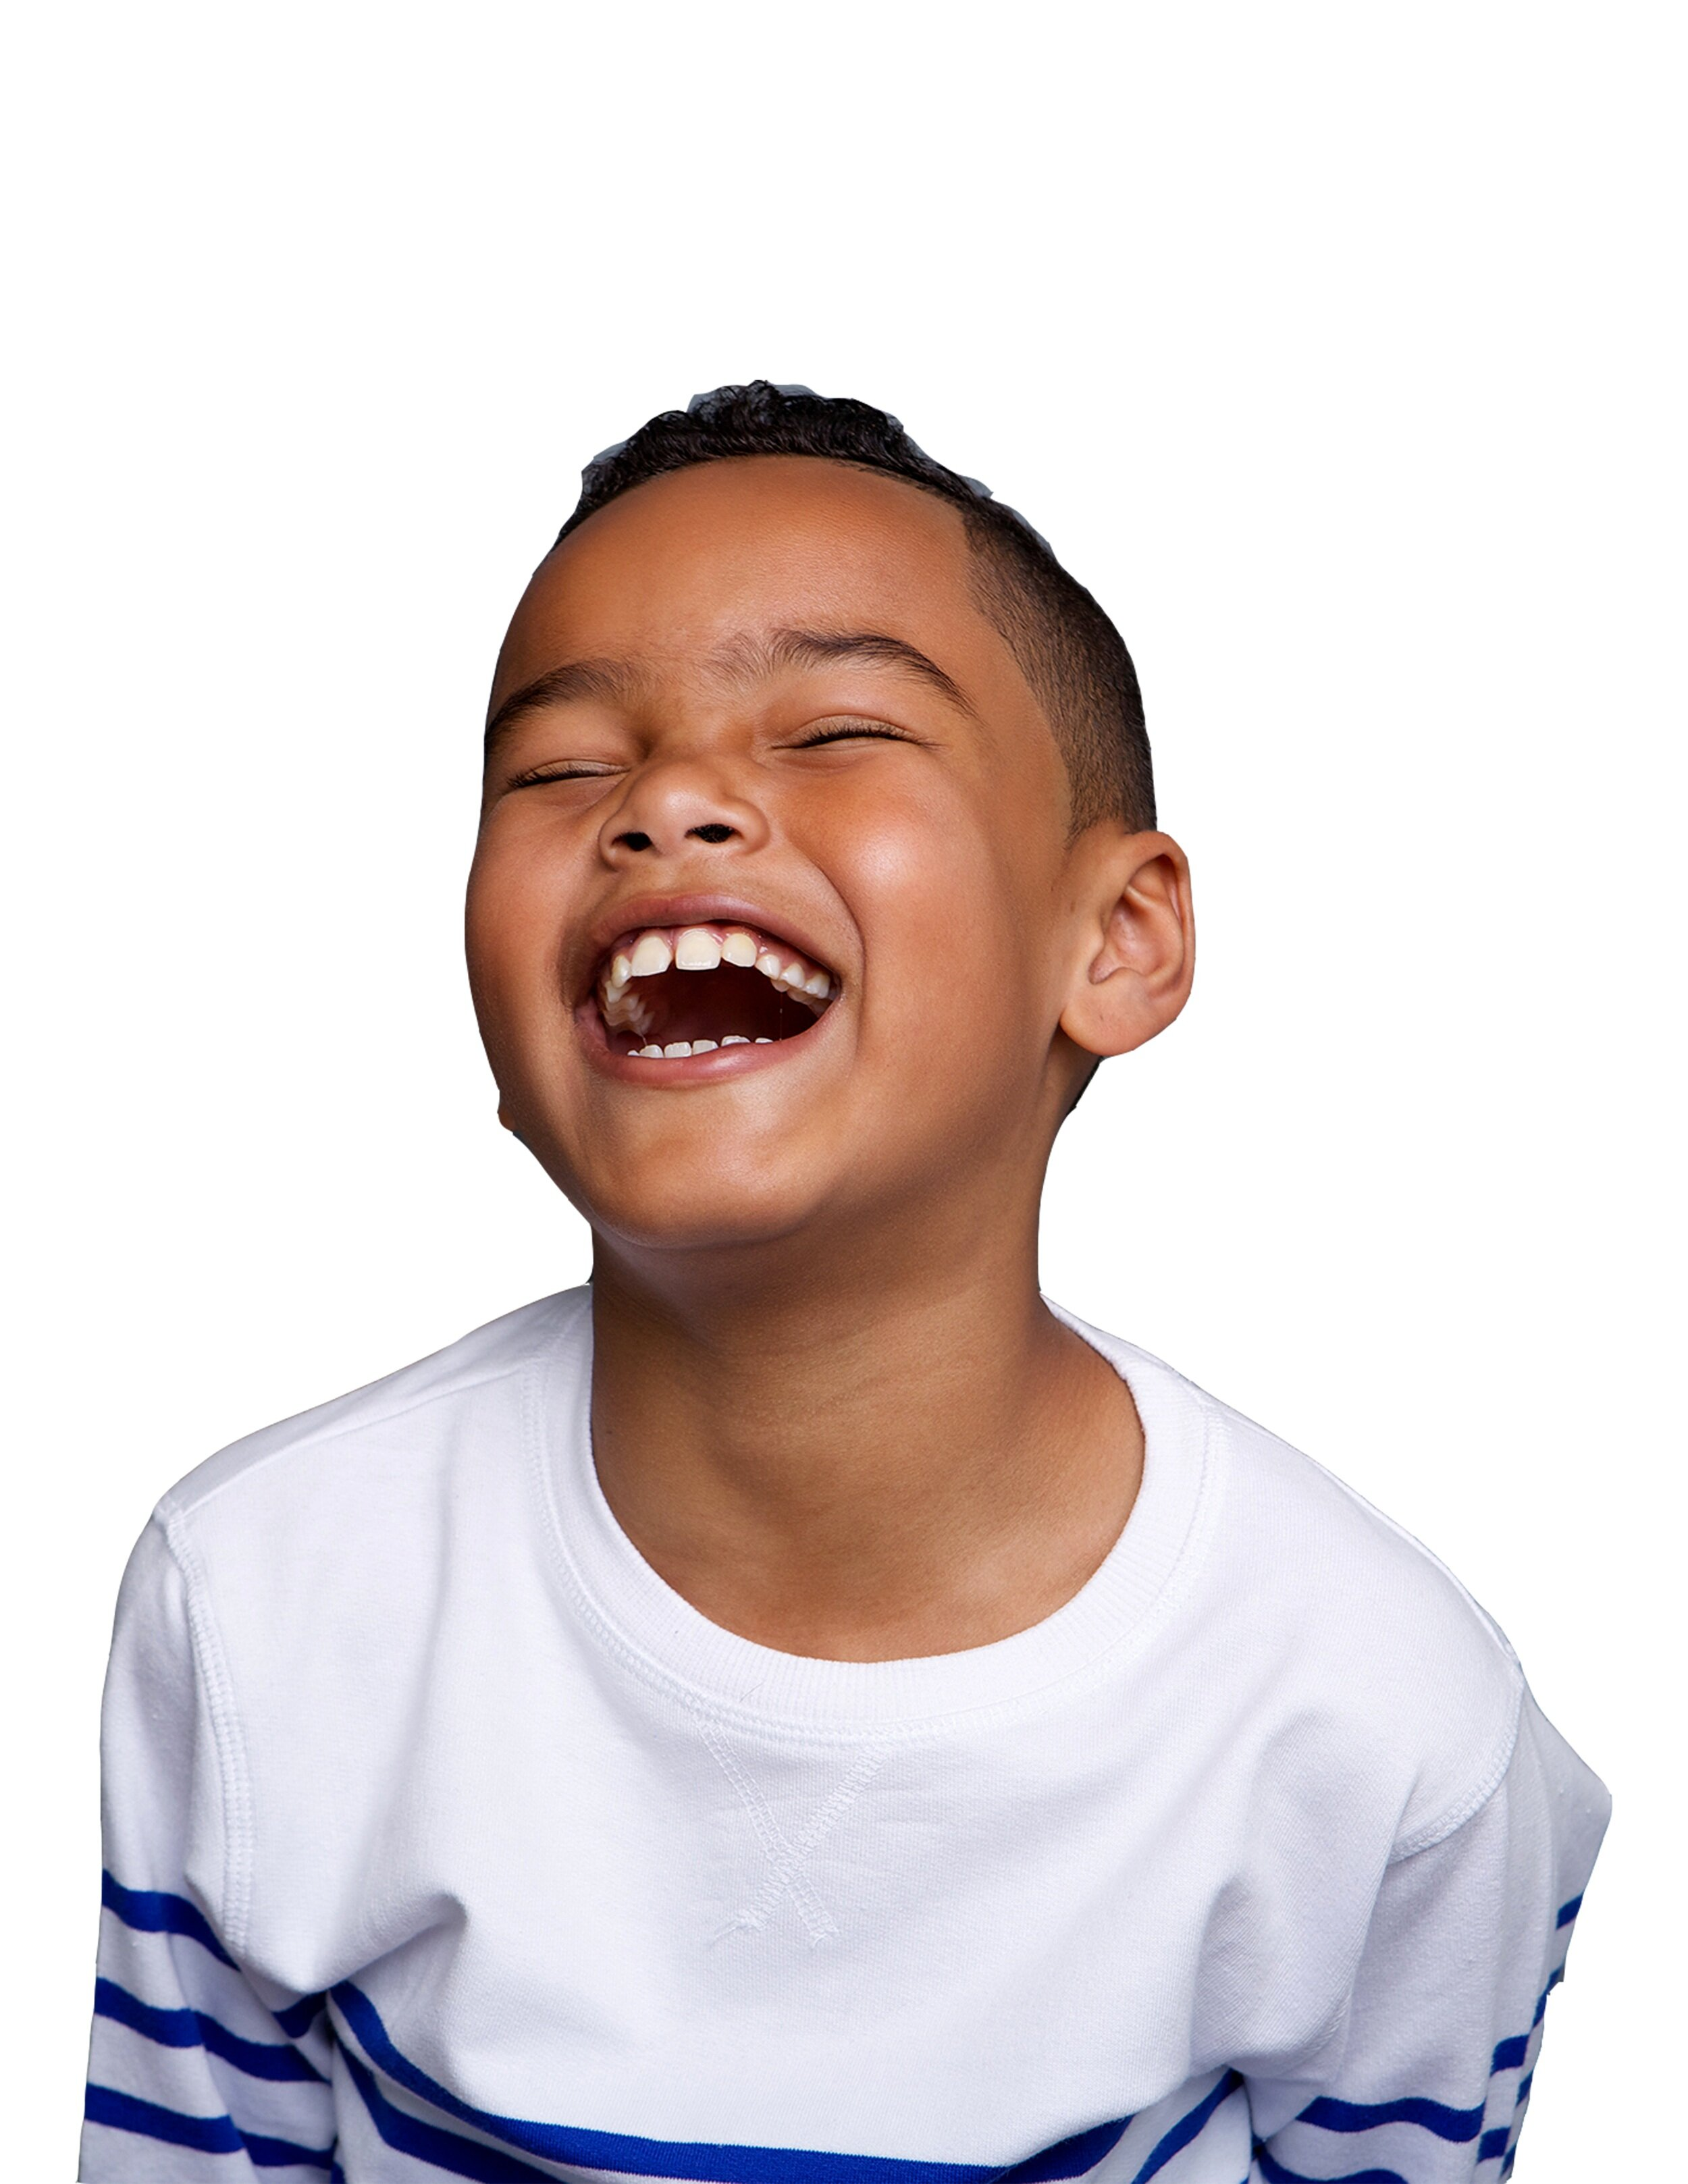 Happy skin … happy teen!